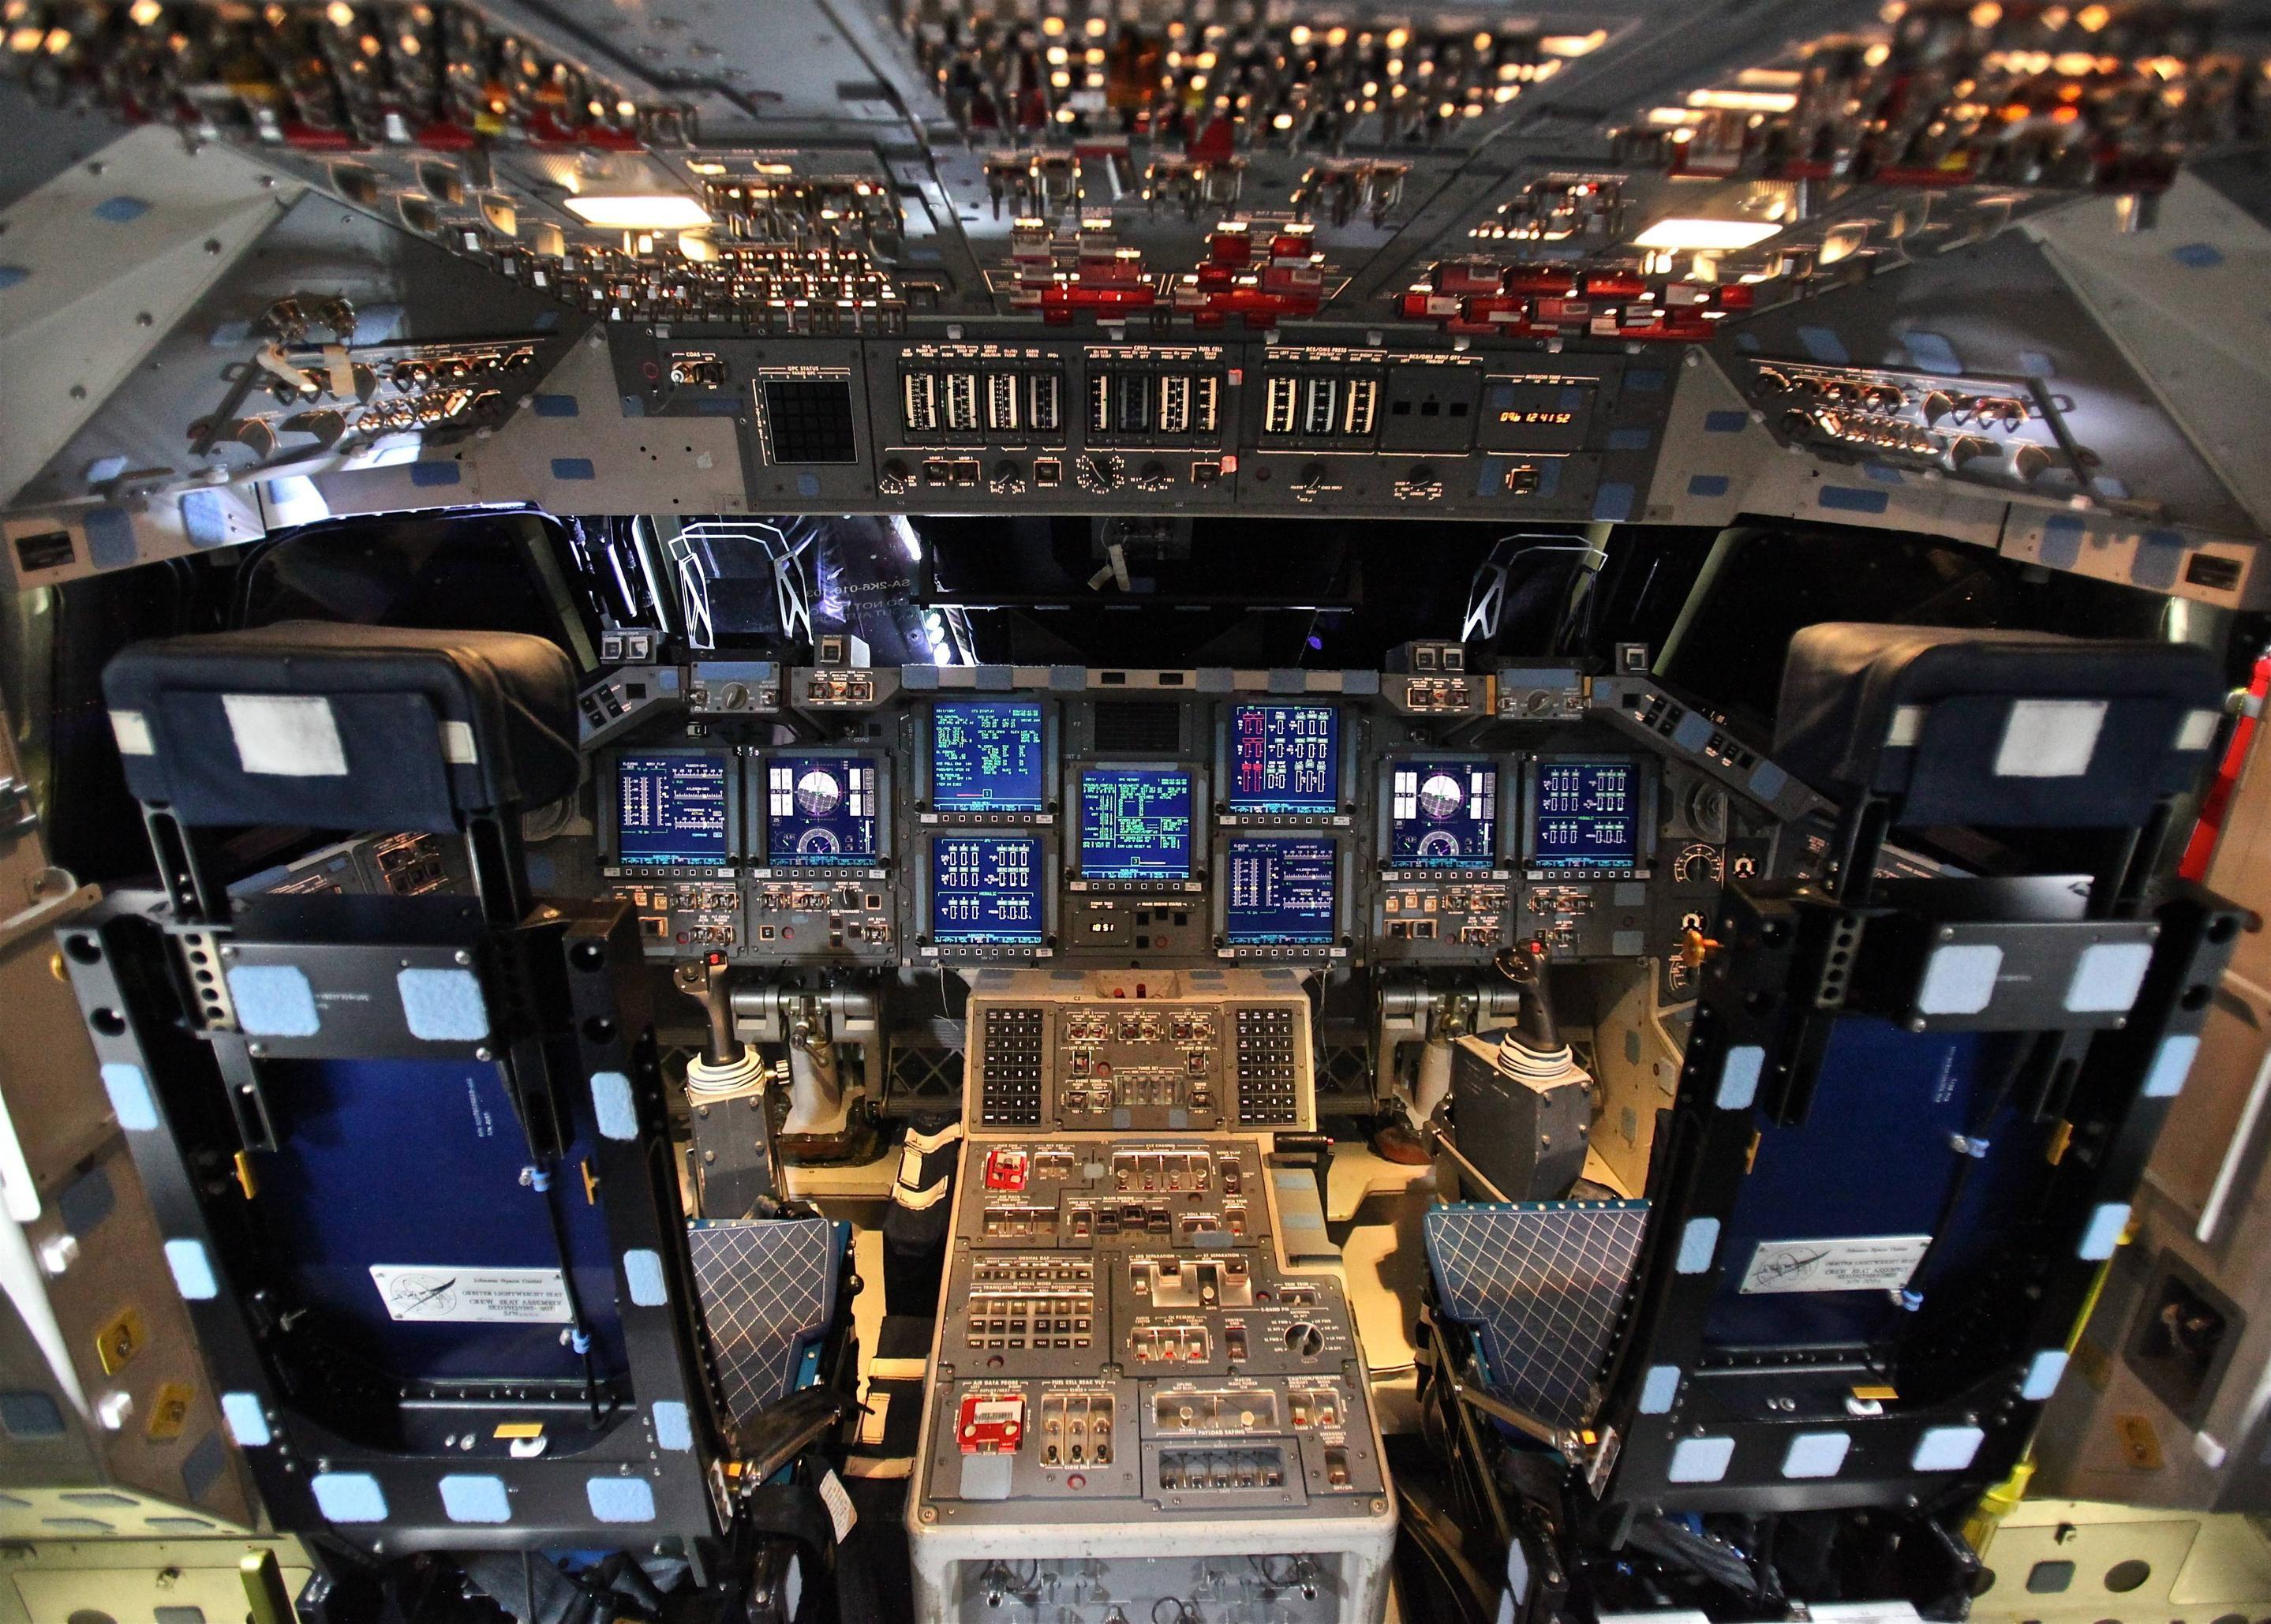 F14A+Cockpit.jpg (1600×1000) | Naval Aviation Aircraft | Pinterest |  Aviation and Aircraft